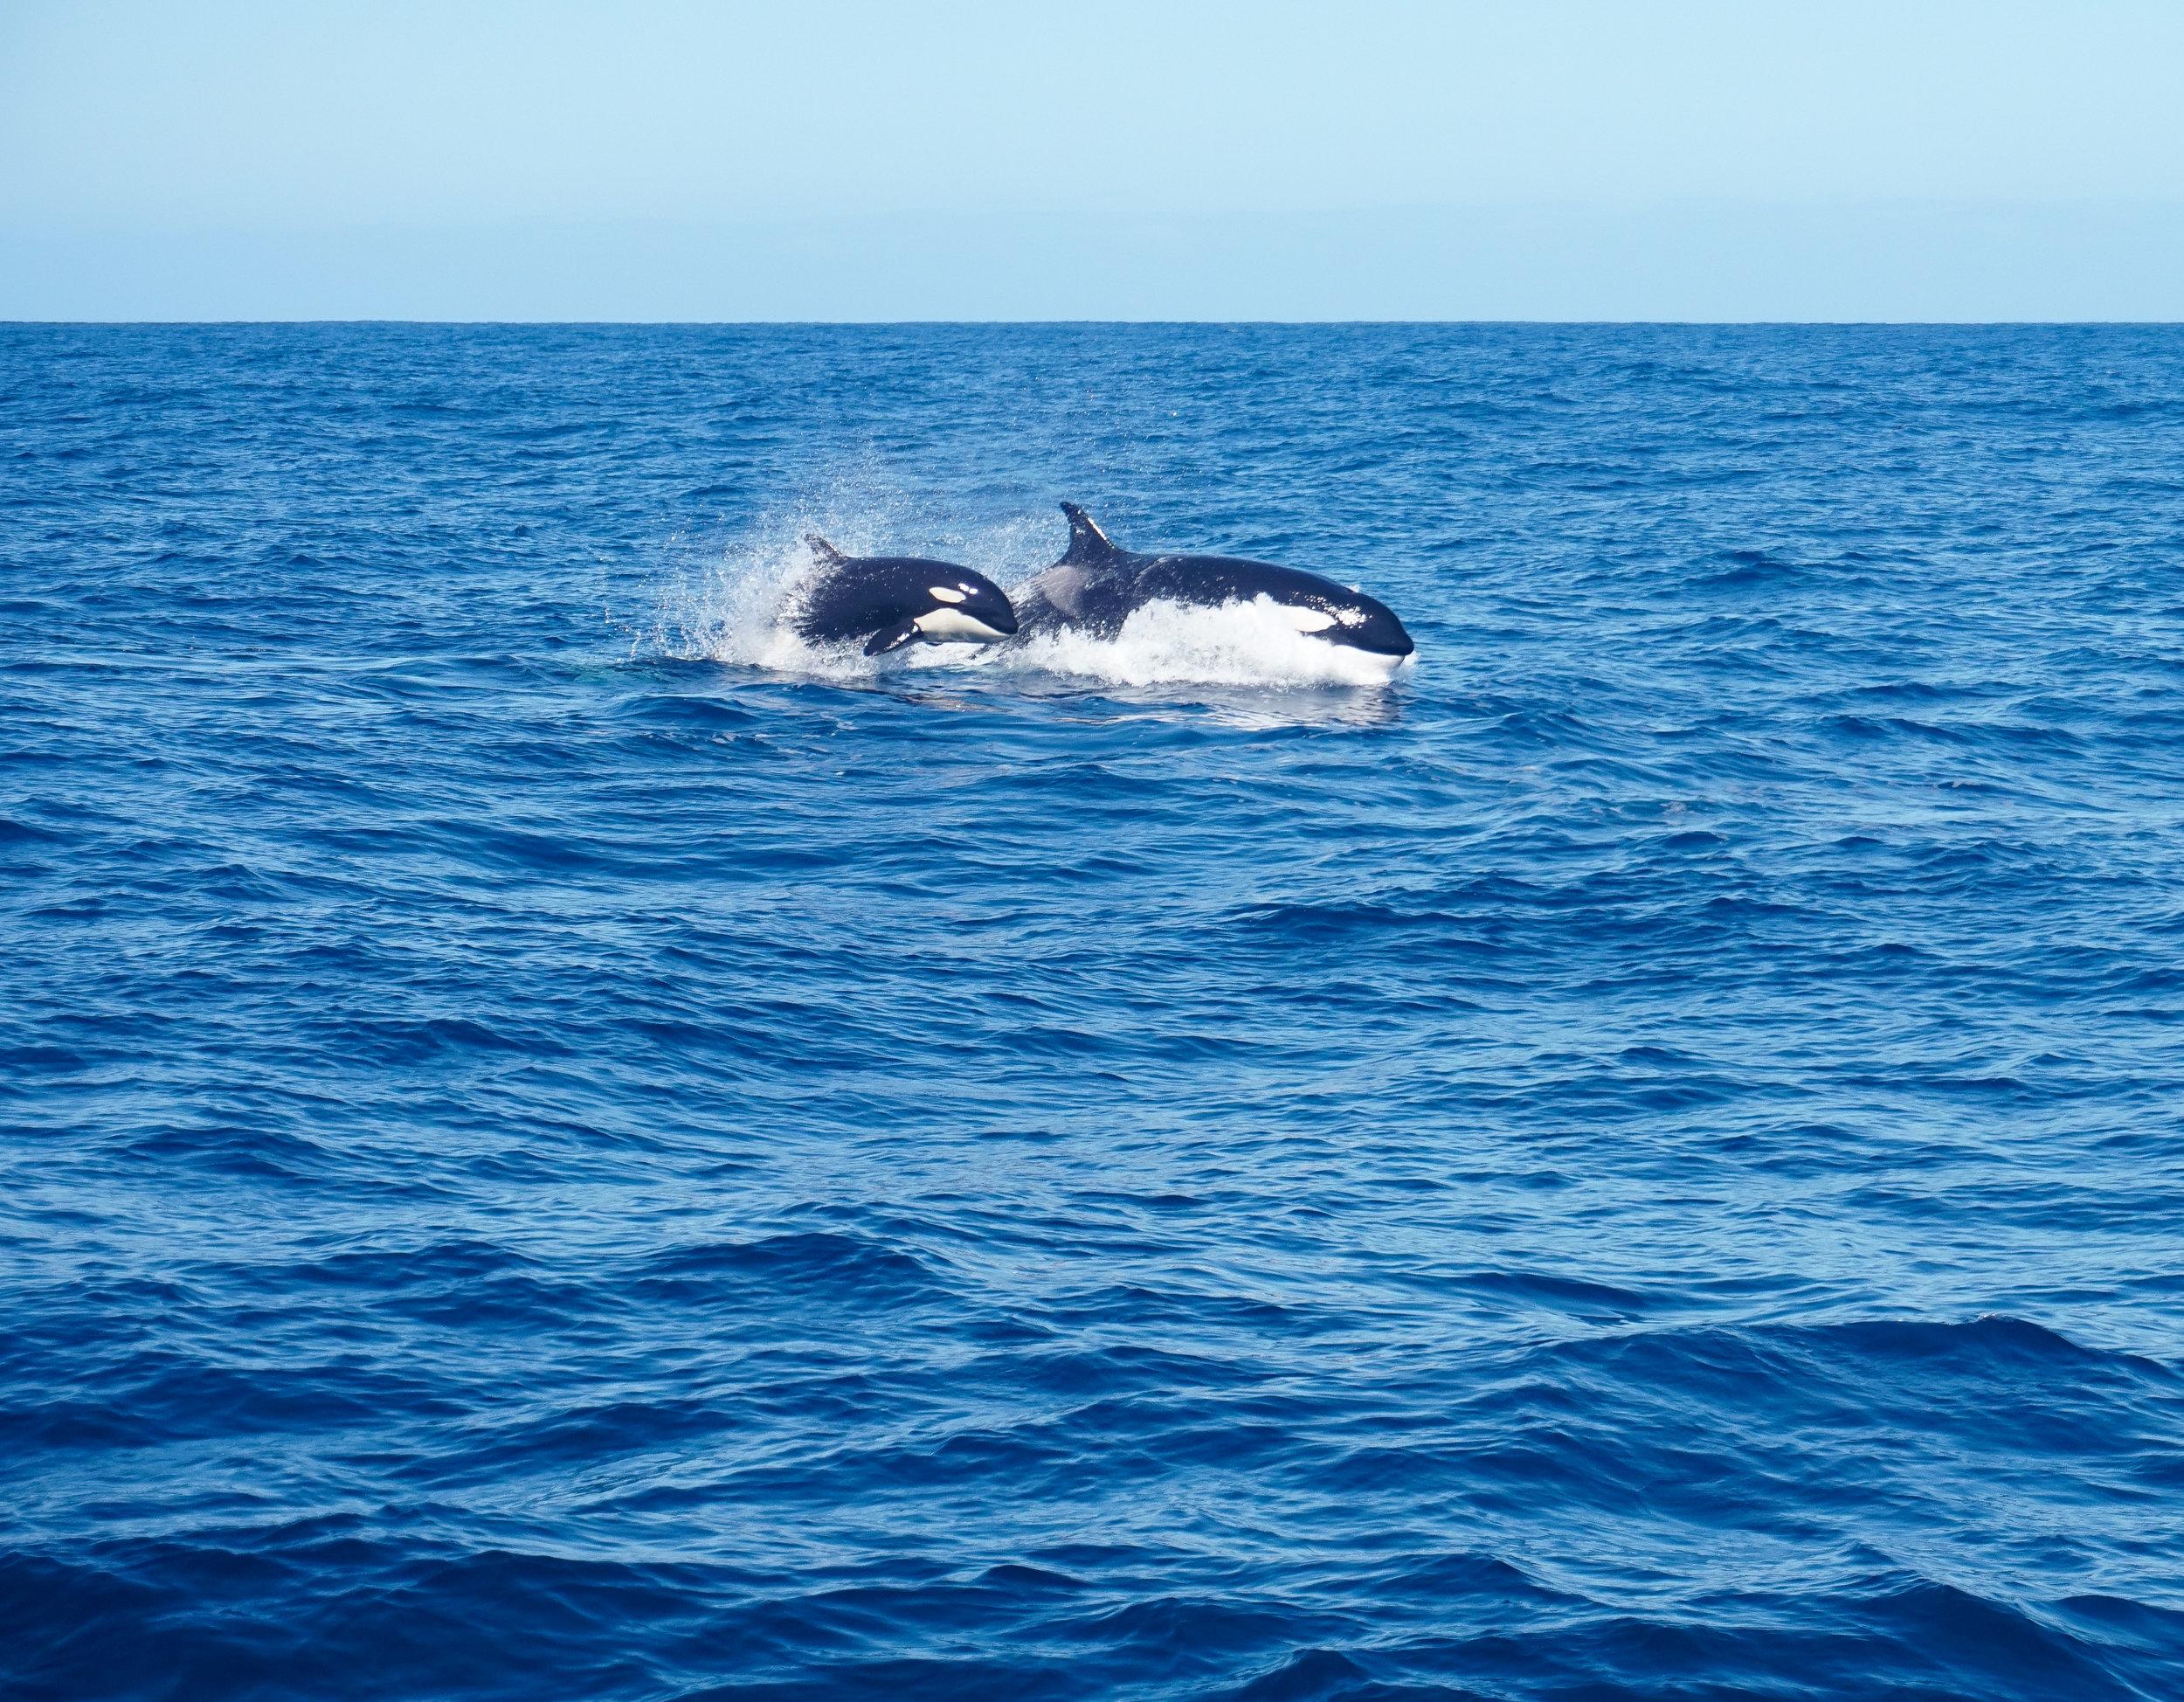 curio.trips.australia.western.whale.watching.mother.calf.landscape-2.jpg